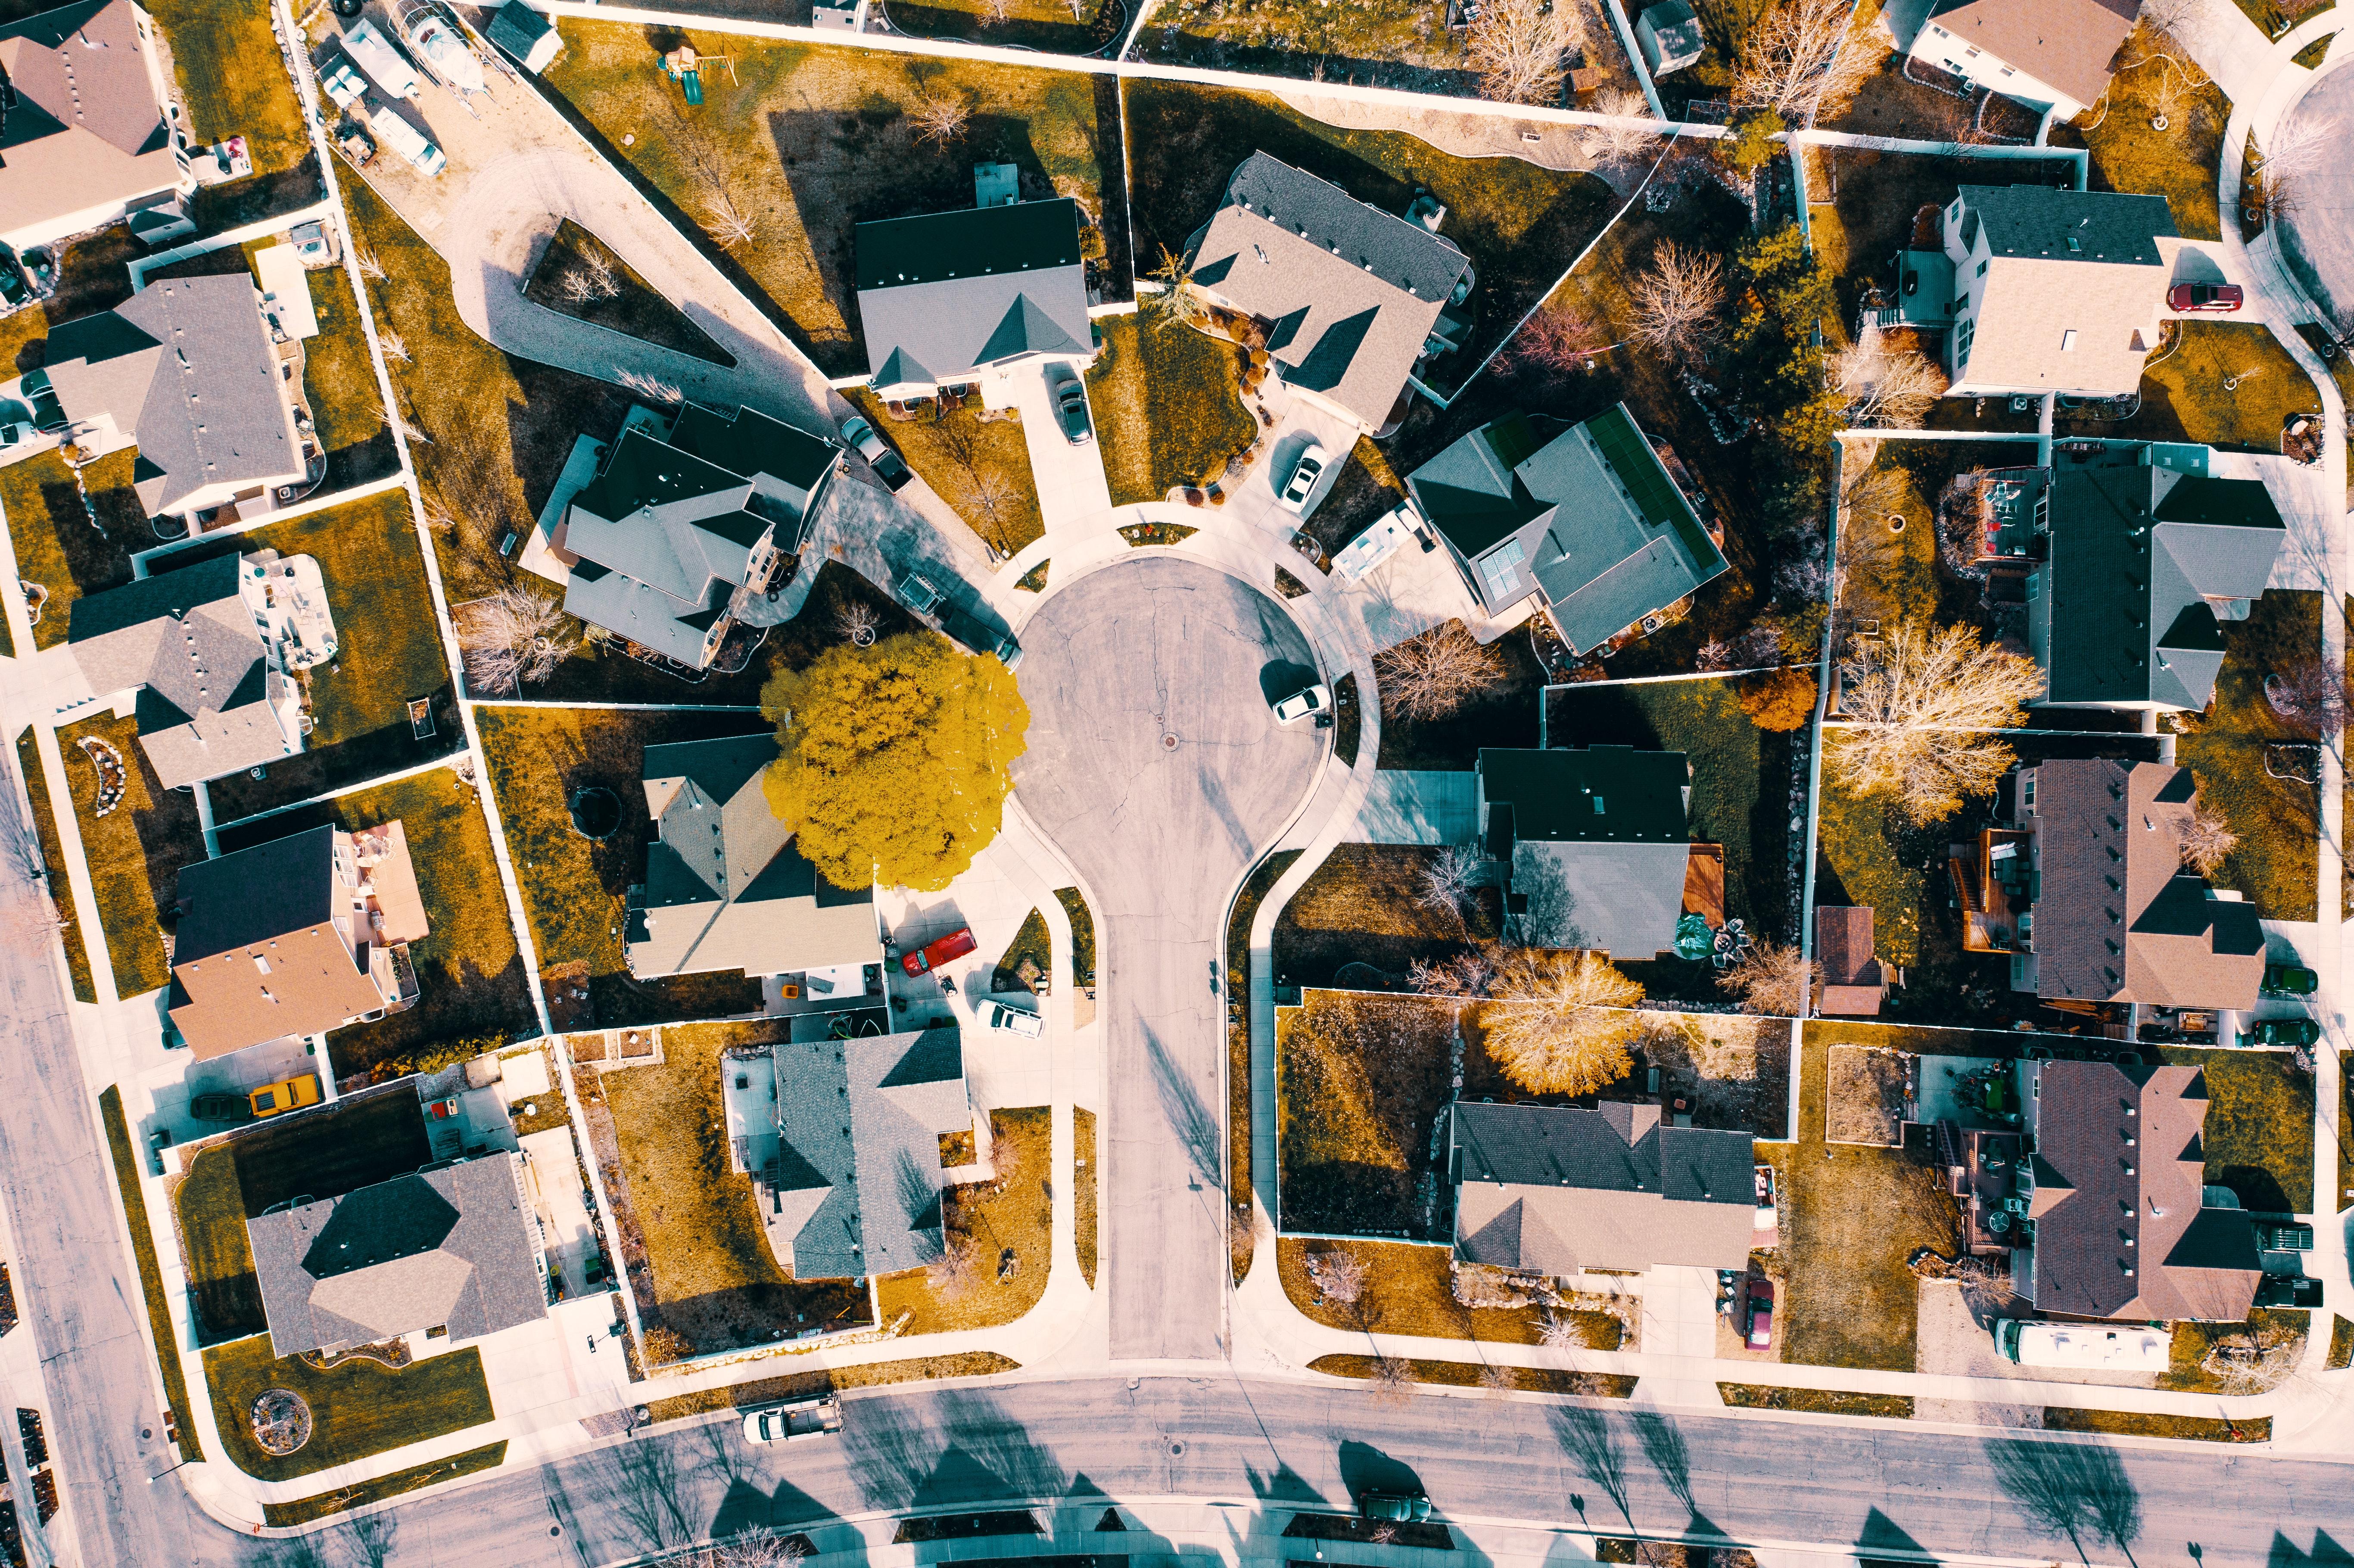 Image for Addressing the Region's Housing Dilemma